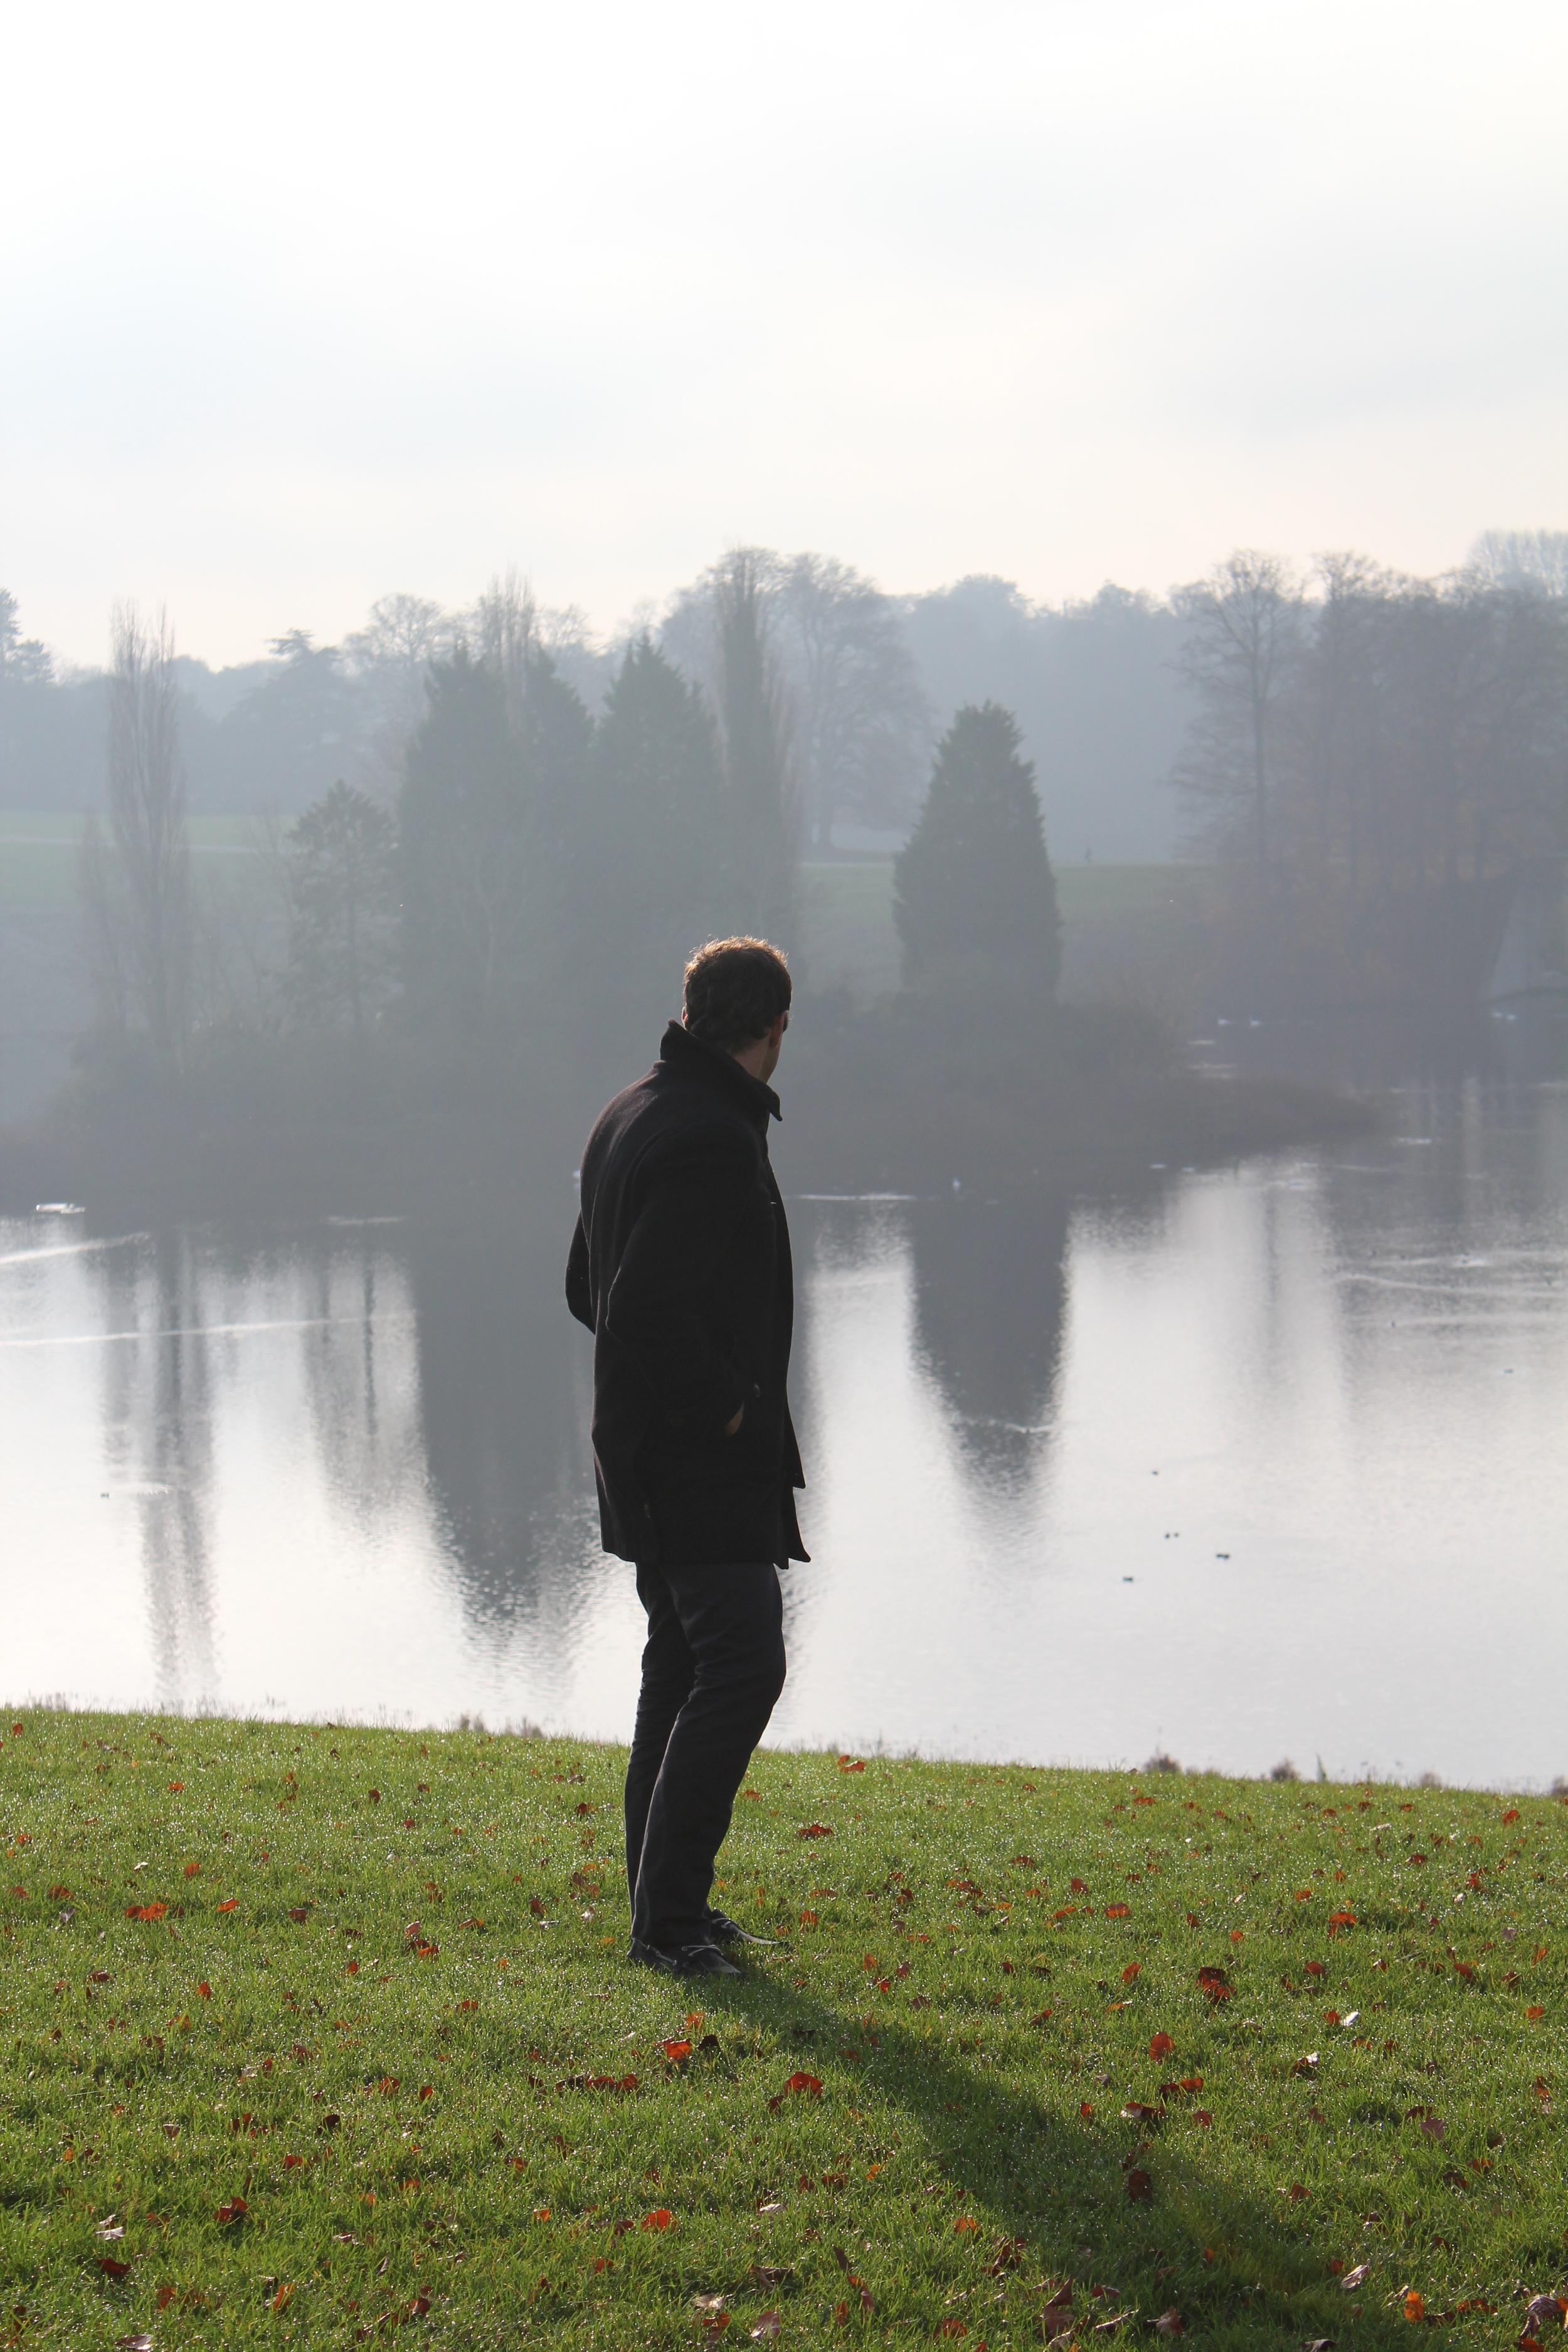 Ryan J Pemberton outside Blenheim Palace, Oxfordshire, England